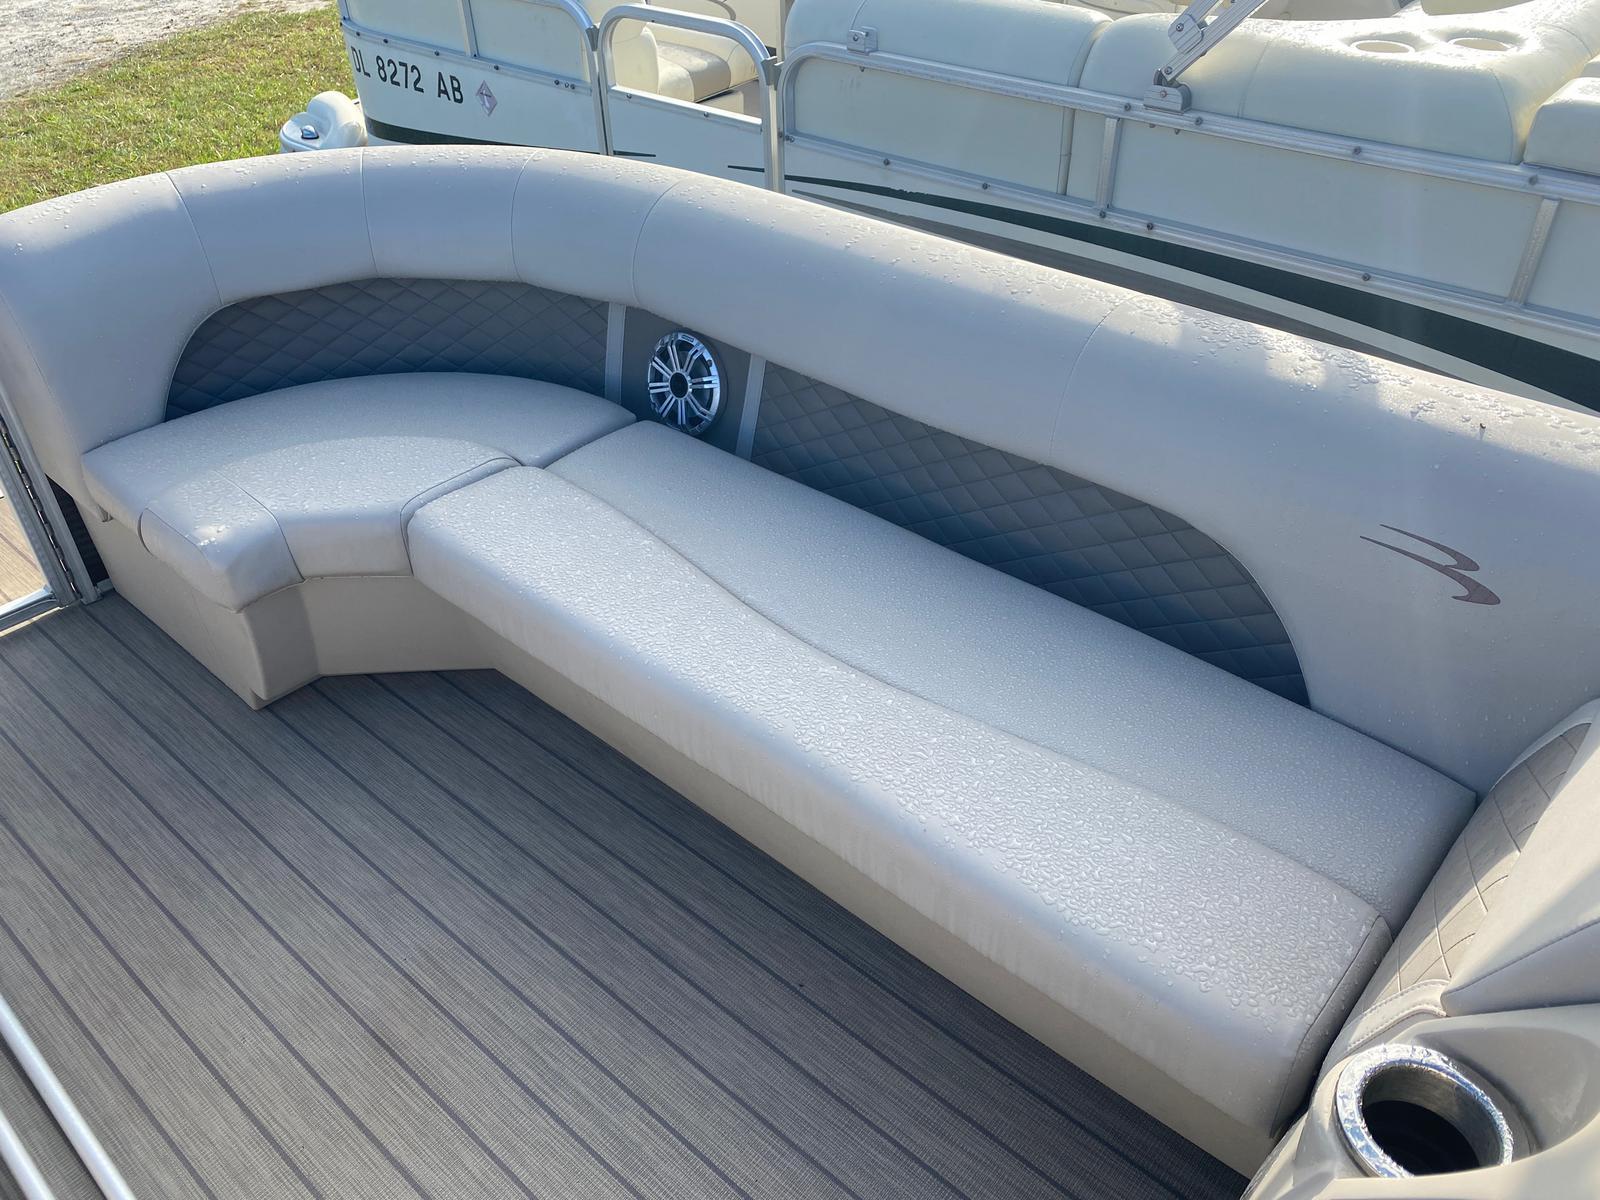 2018 Bennington boat for sale, model of the boat is 22 SSX Pontoon & Image # 9 of 13